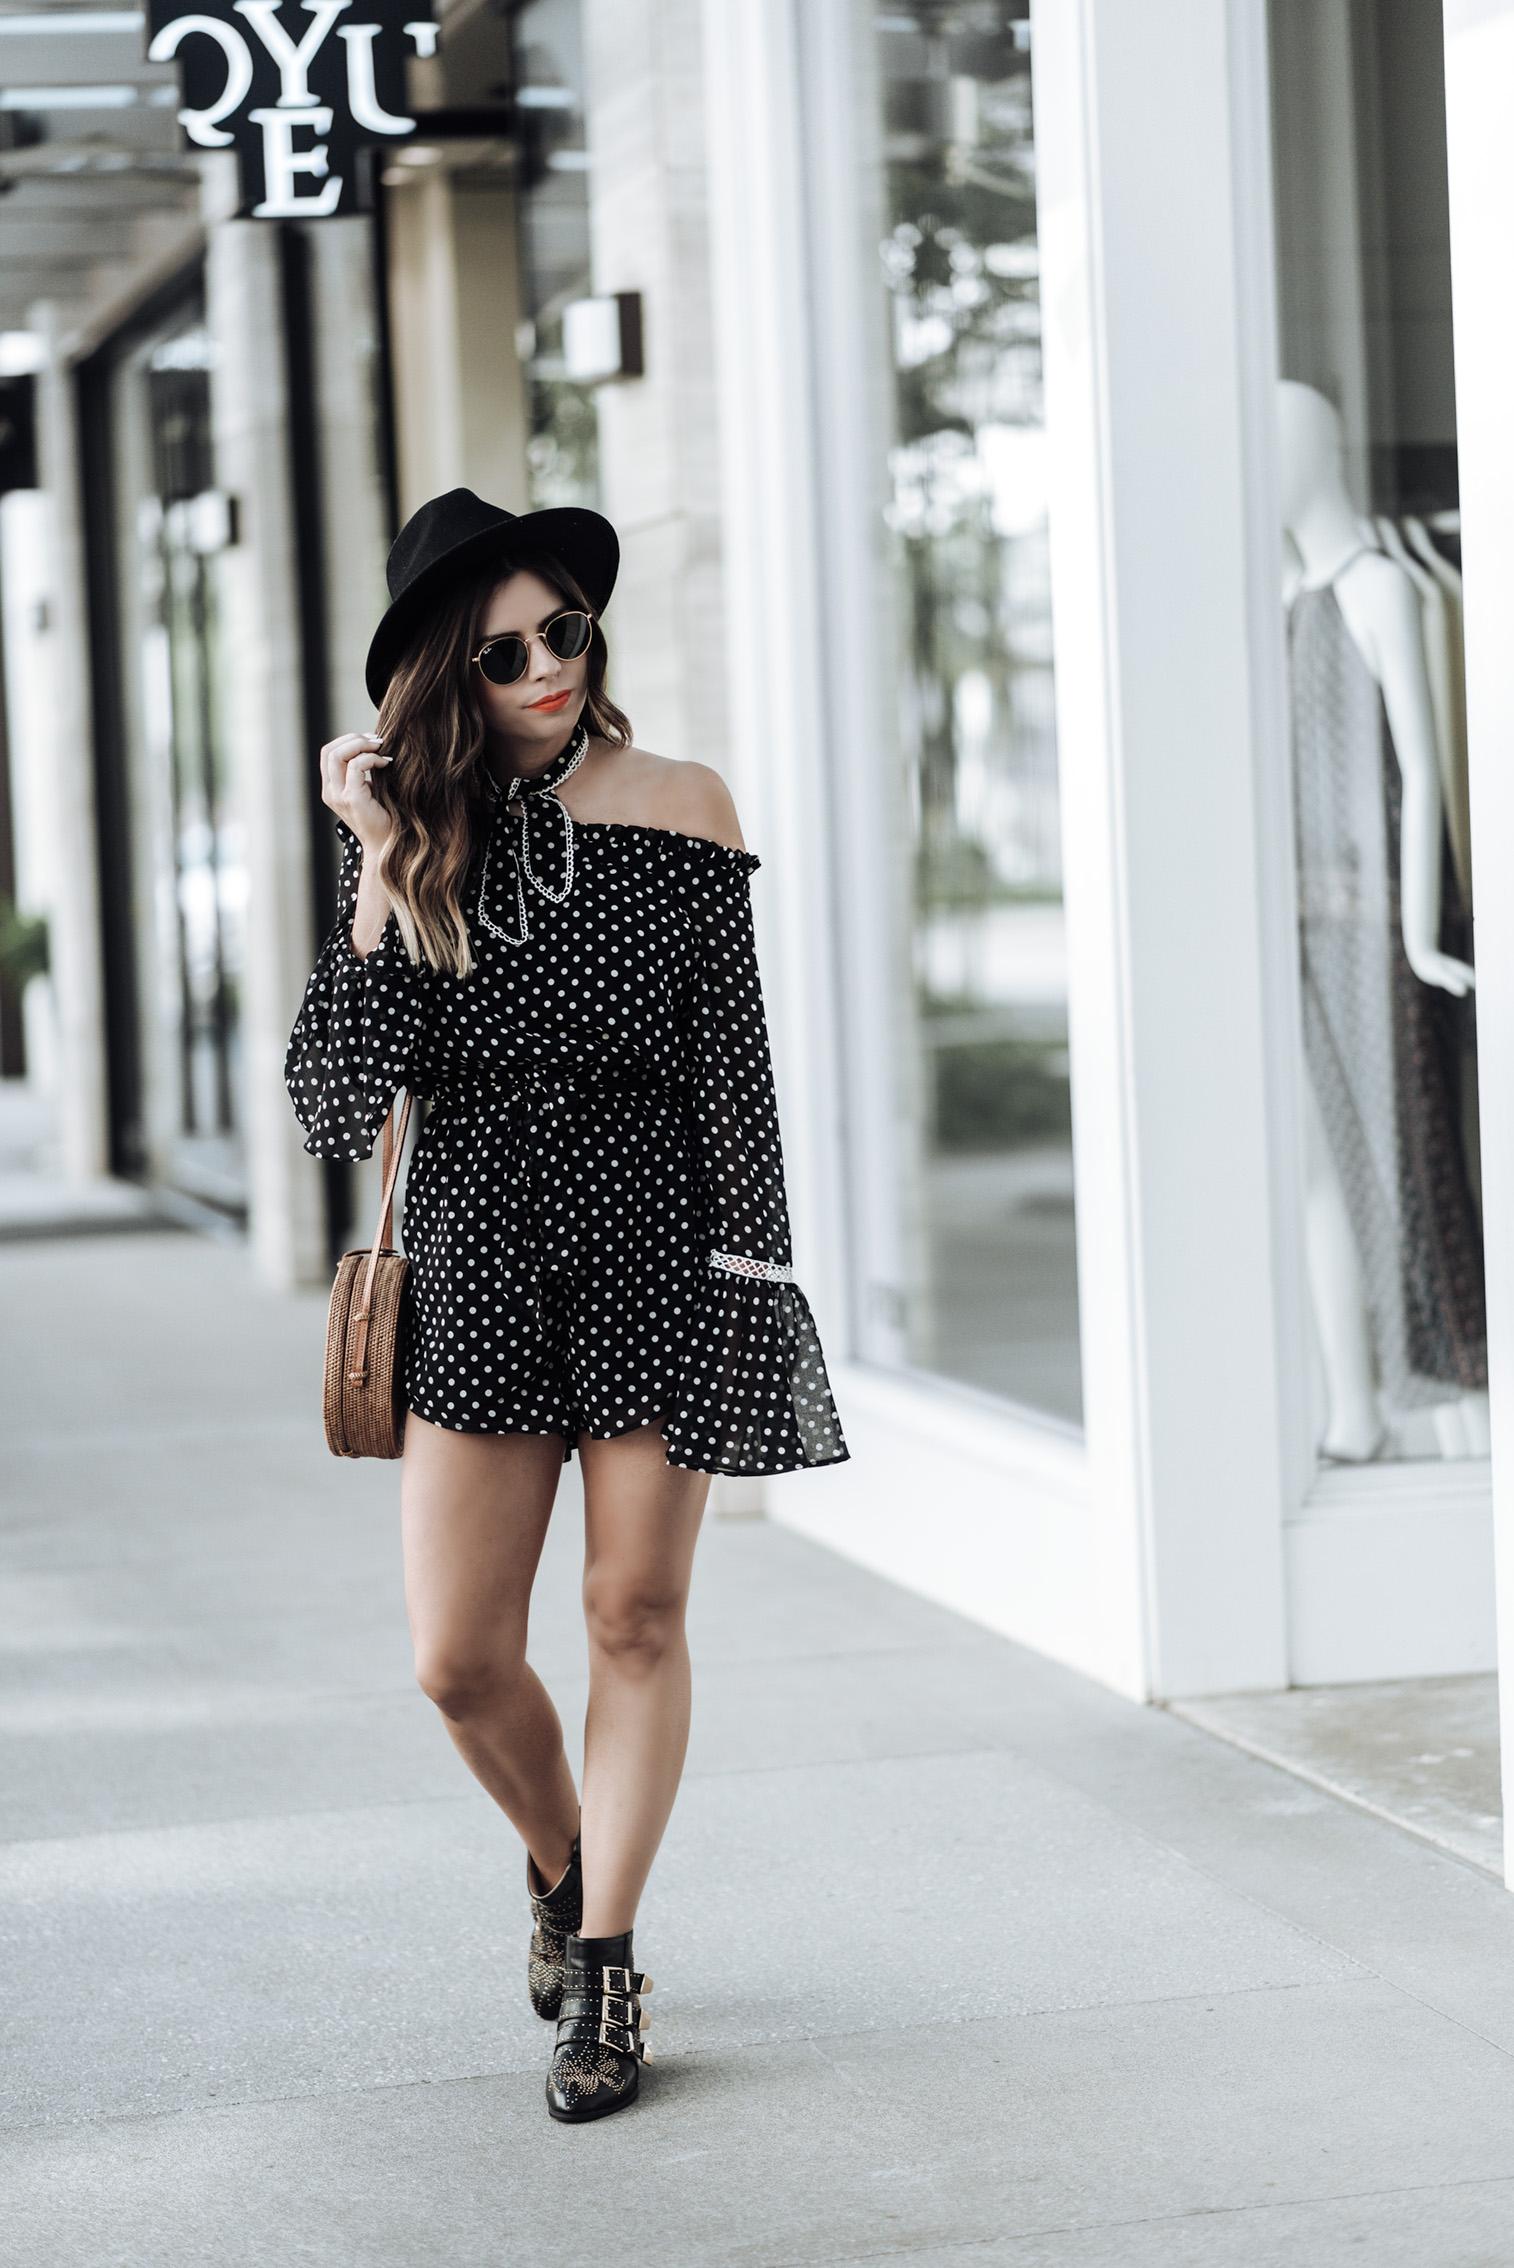 Tiffany Jais Houston fashion and lifestyle blogger | polka dot romper | round rattan bag, chloe studded boots, brixton hat , street style looks